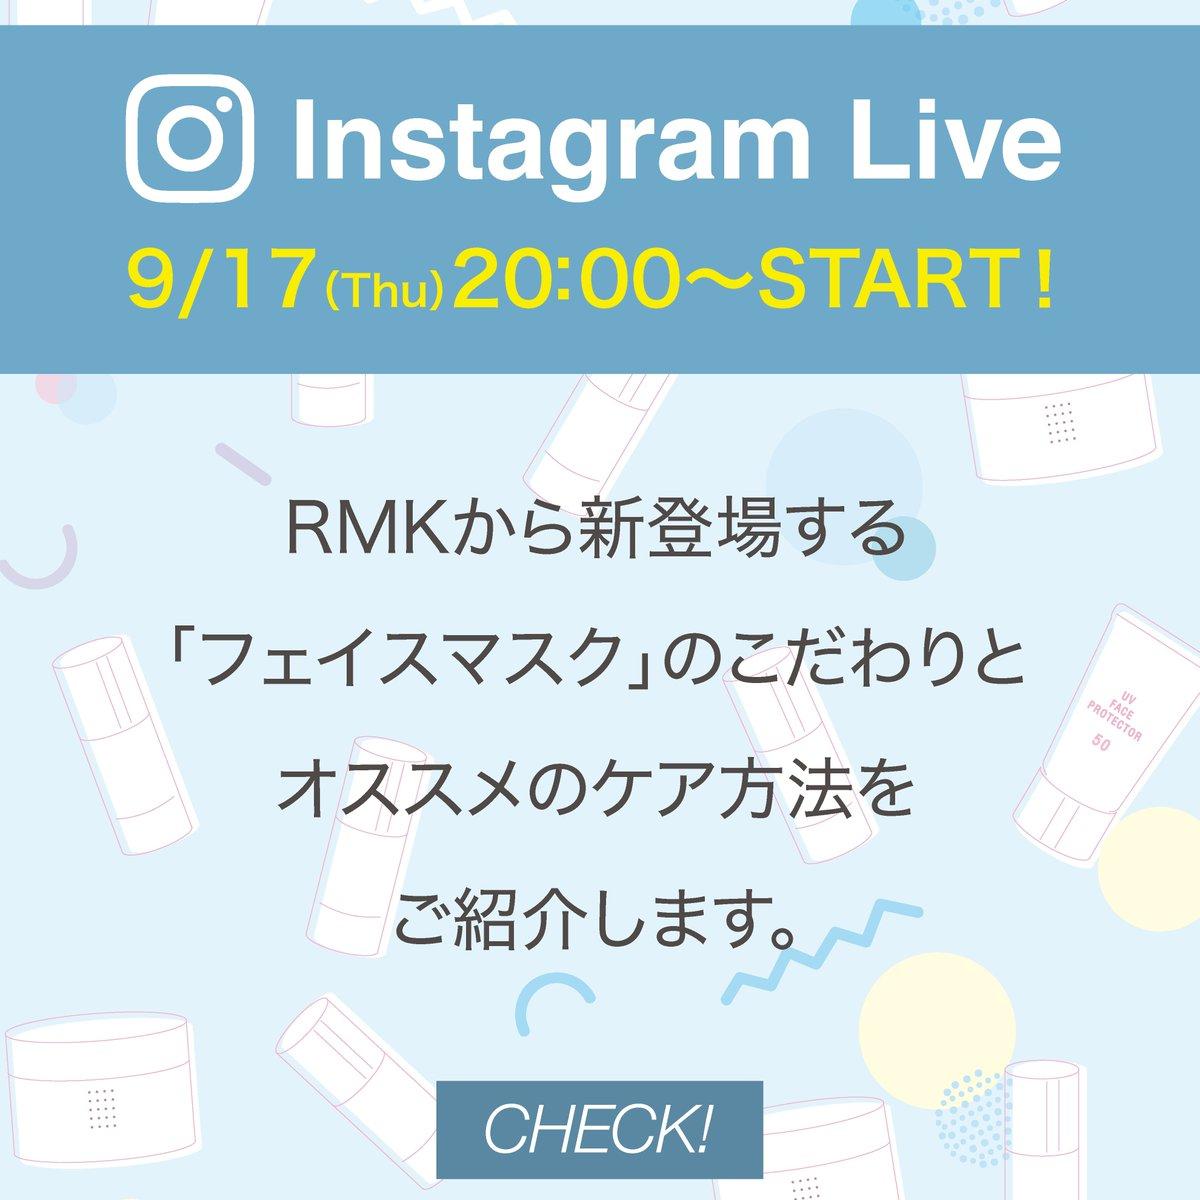 RMKの9月17日のツイッター画像